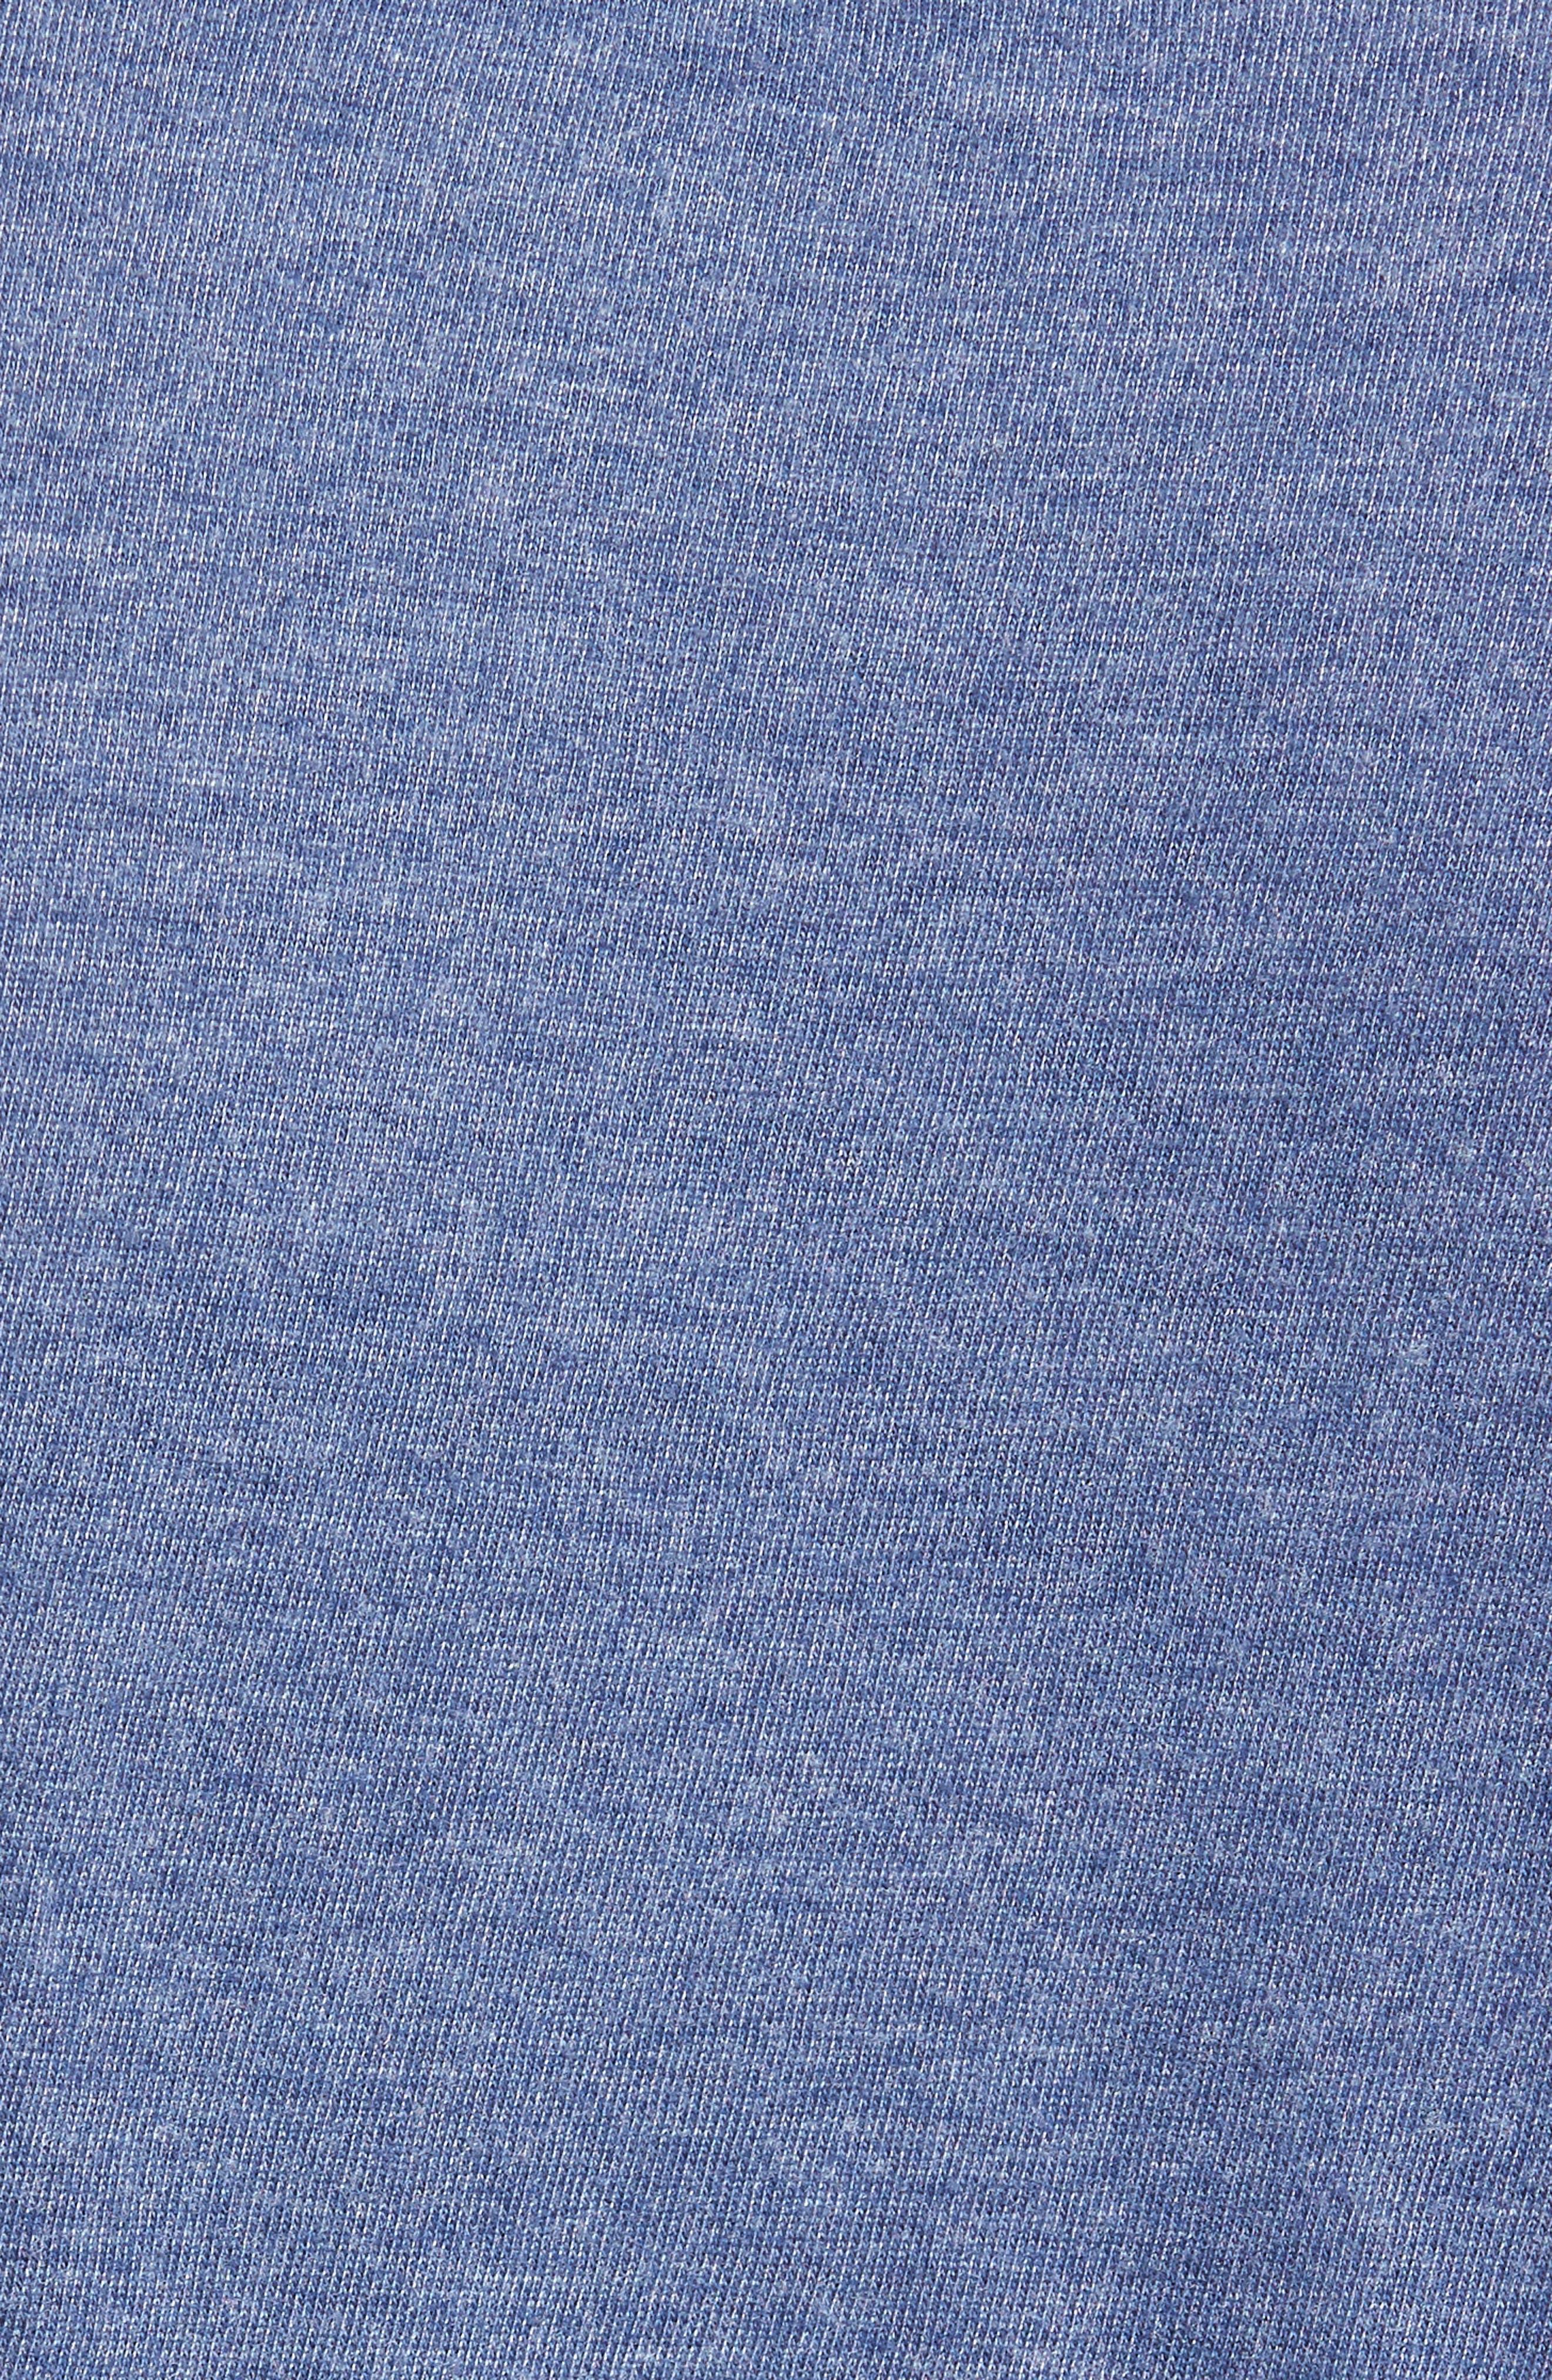 Hillwood Chicago Cubs T-Shirt,                             Alternate thumbnail 5, color,                             422